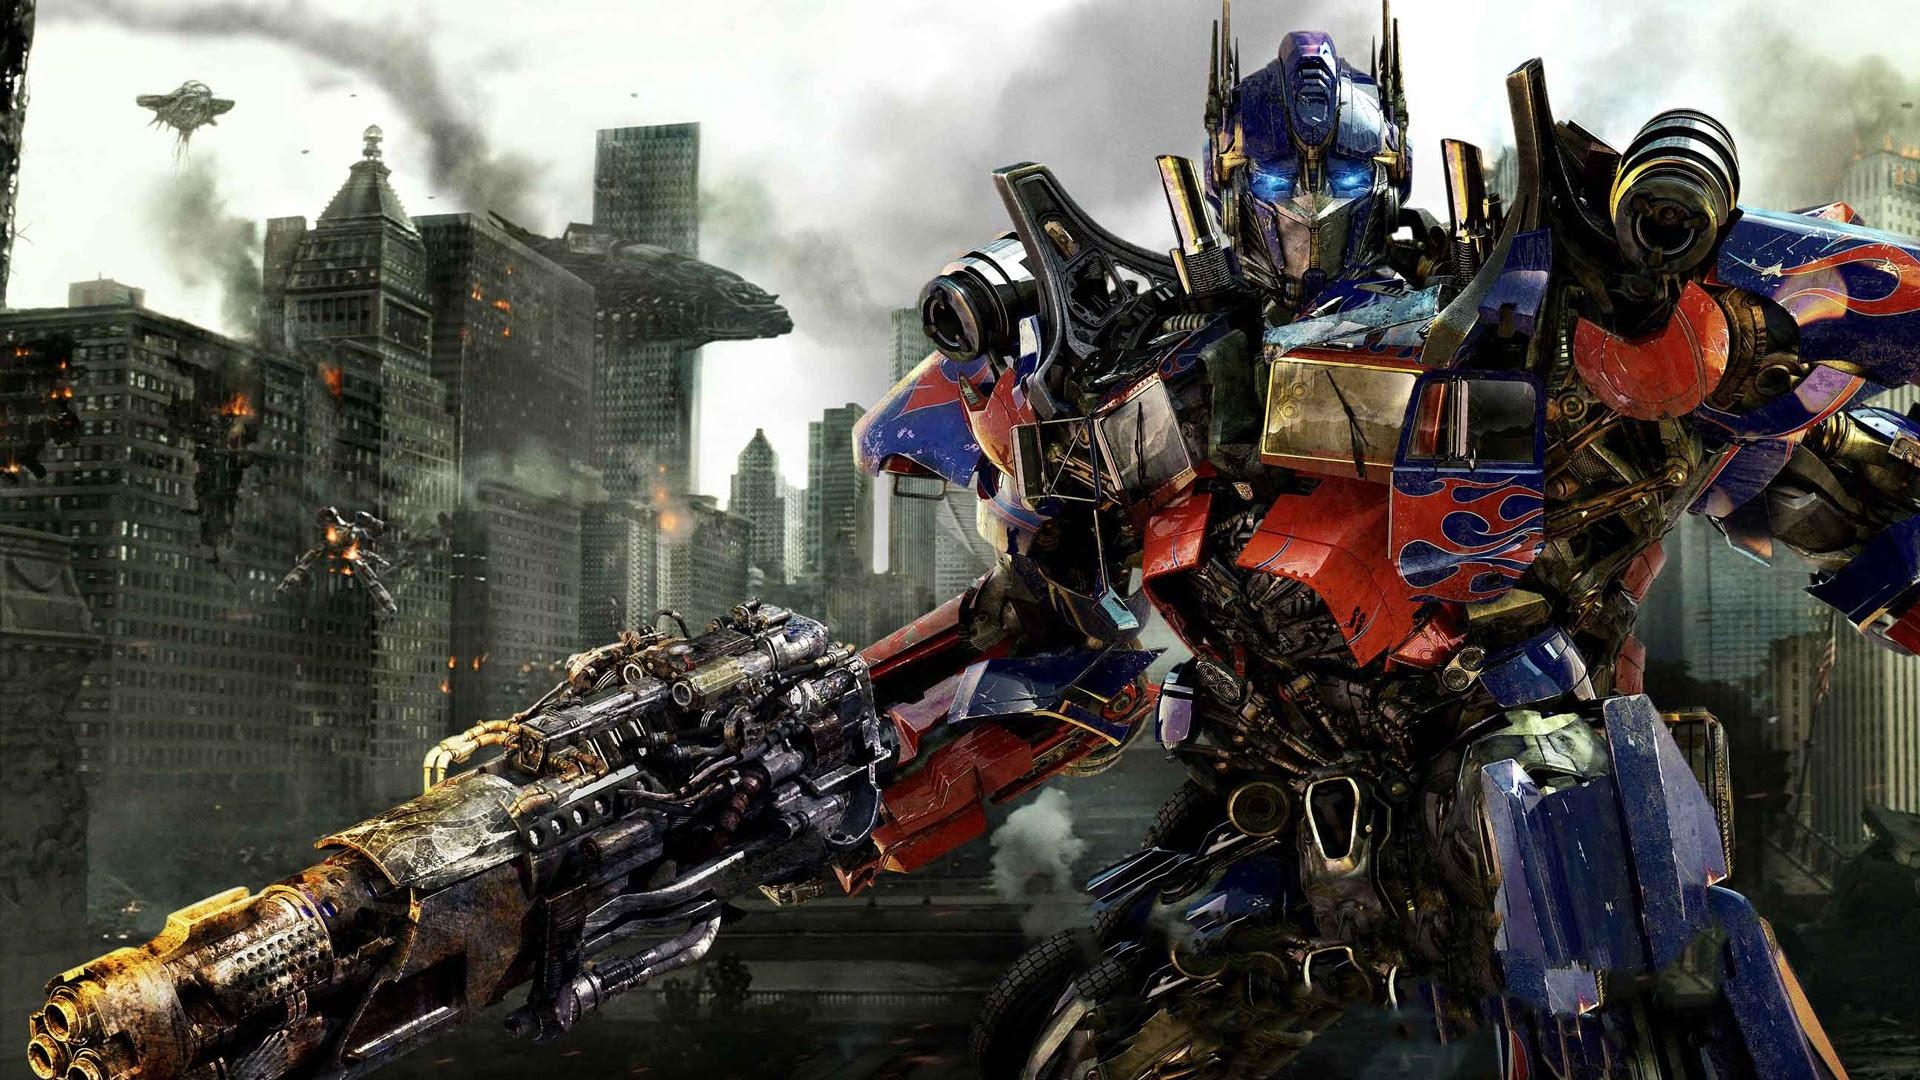 Best Wallpaper Wallpaper Pc Transformers